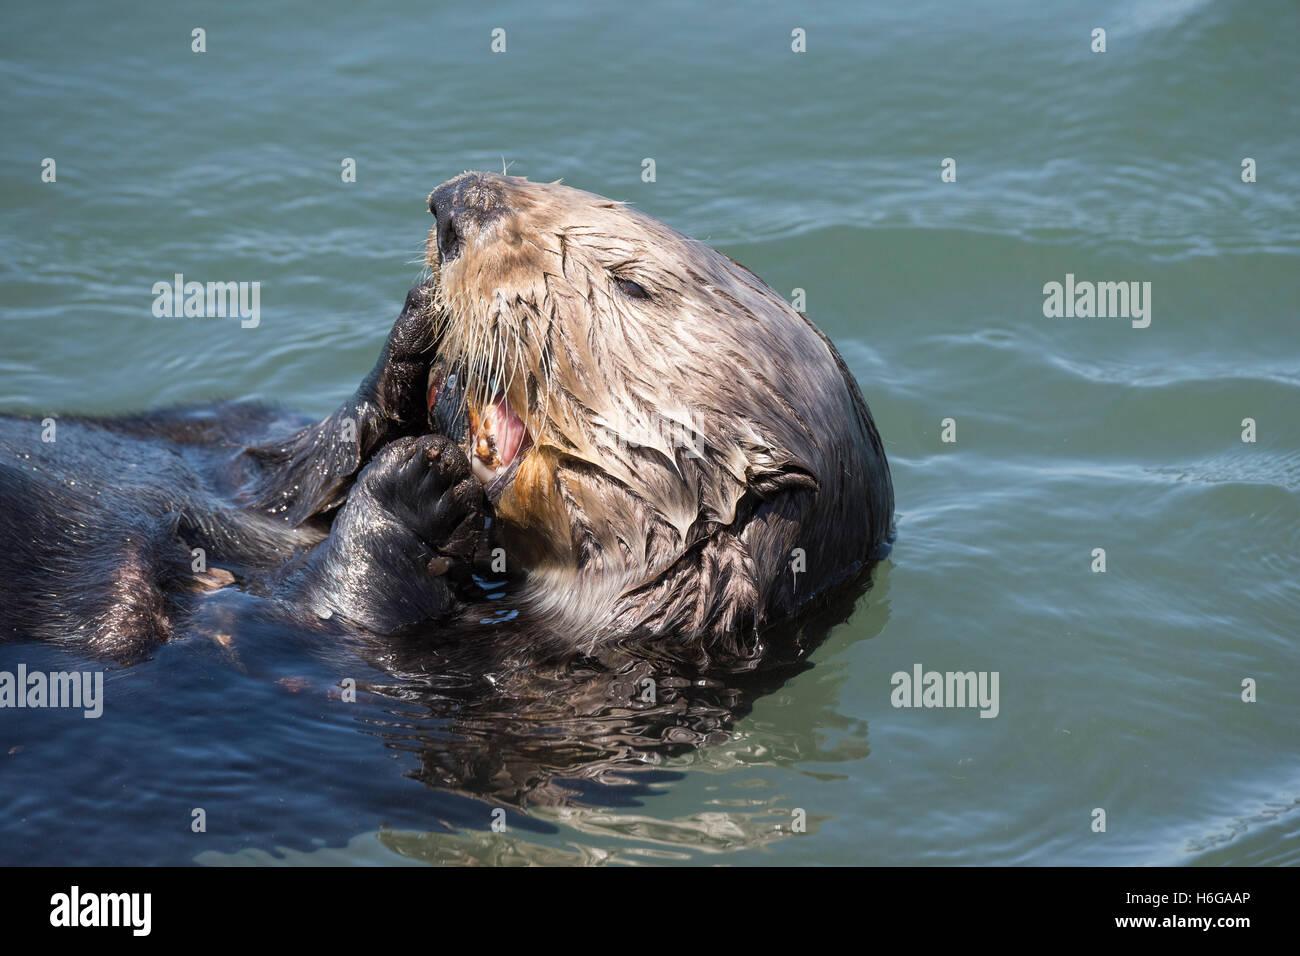 California sea otter, Enhydra lutris nereis, eating a mussel, Elkhorn Slough, Moss Landing, California, USA - Stock Image